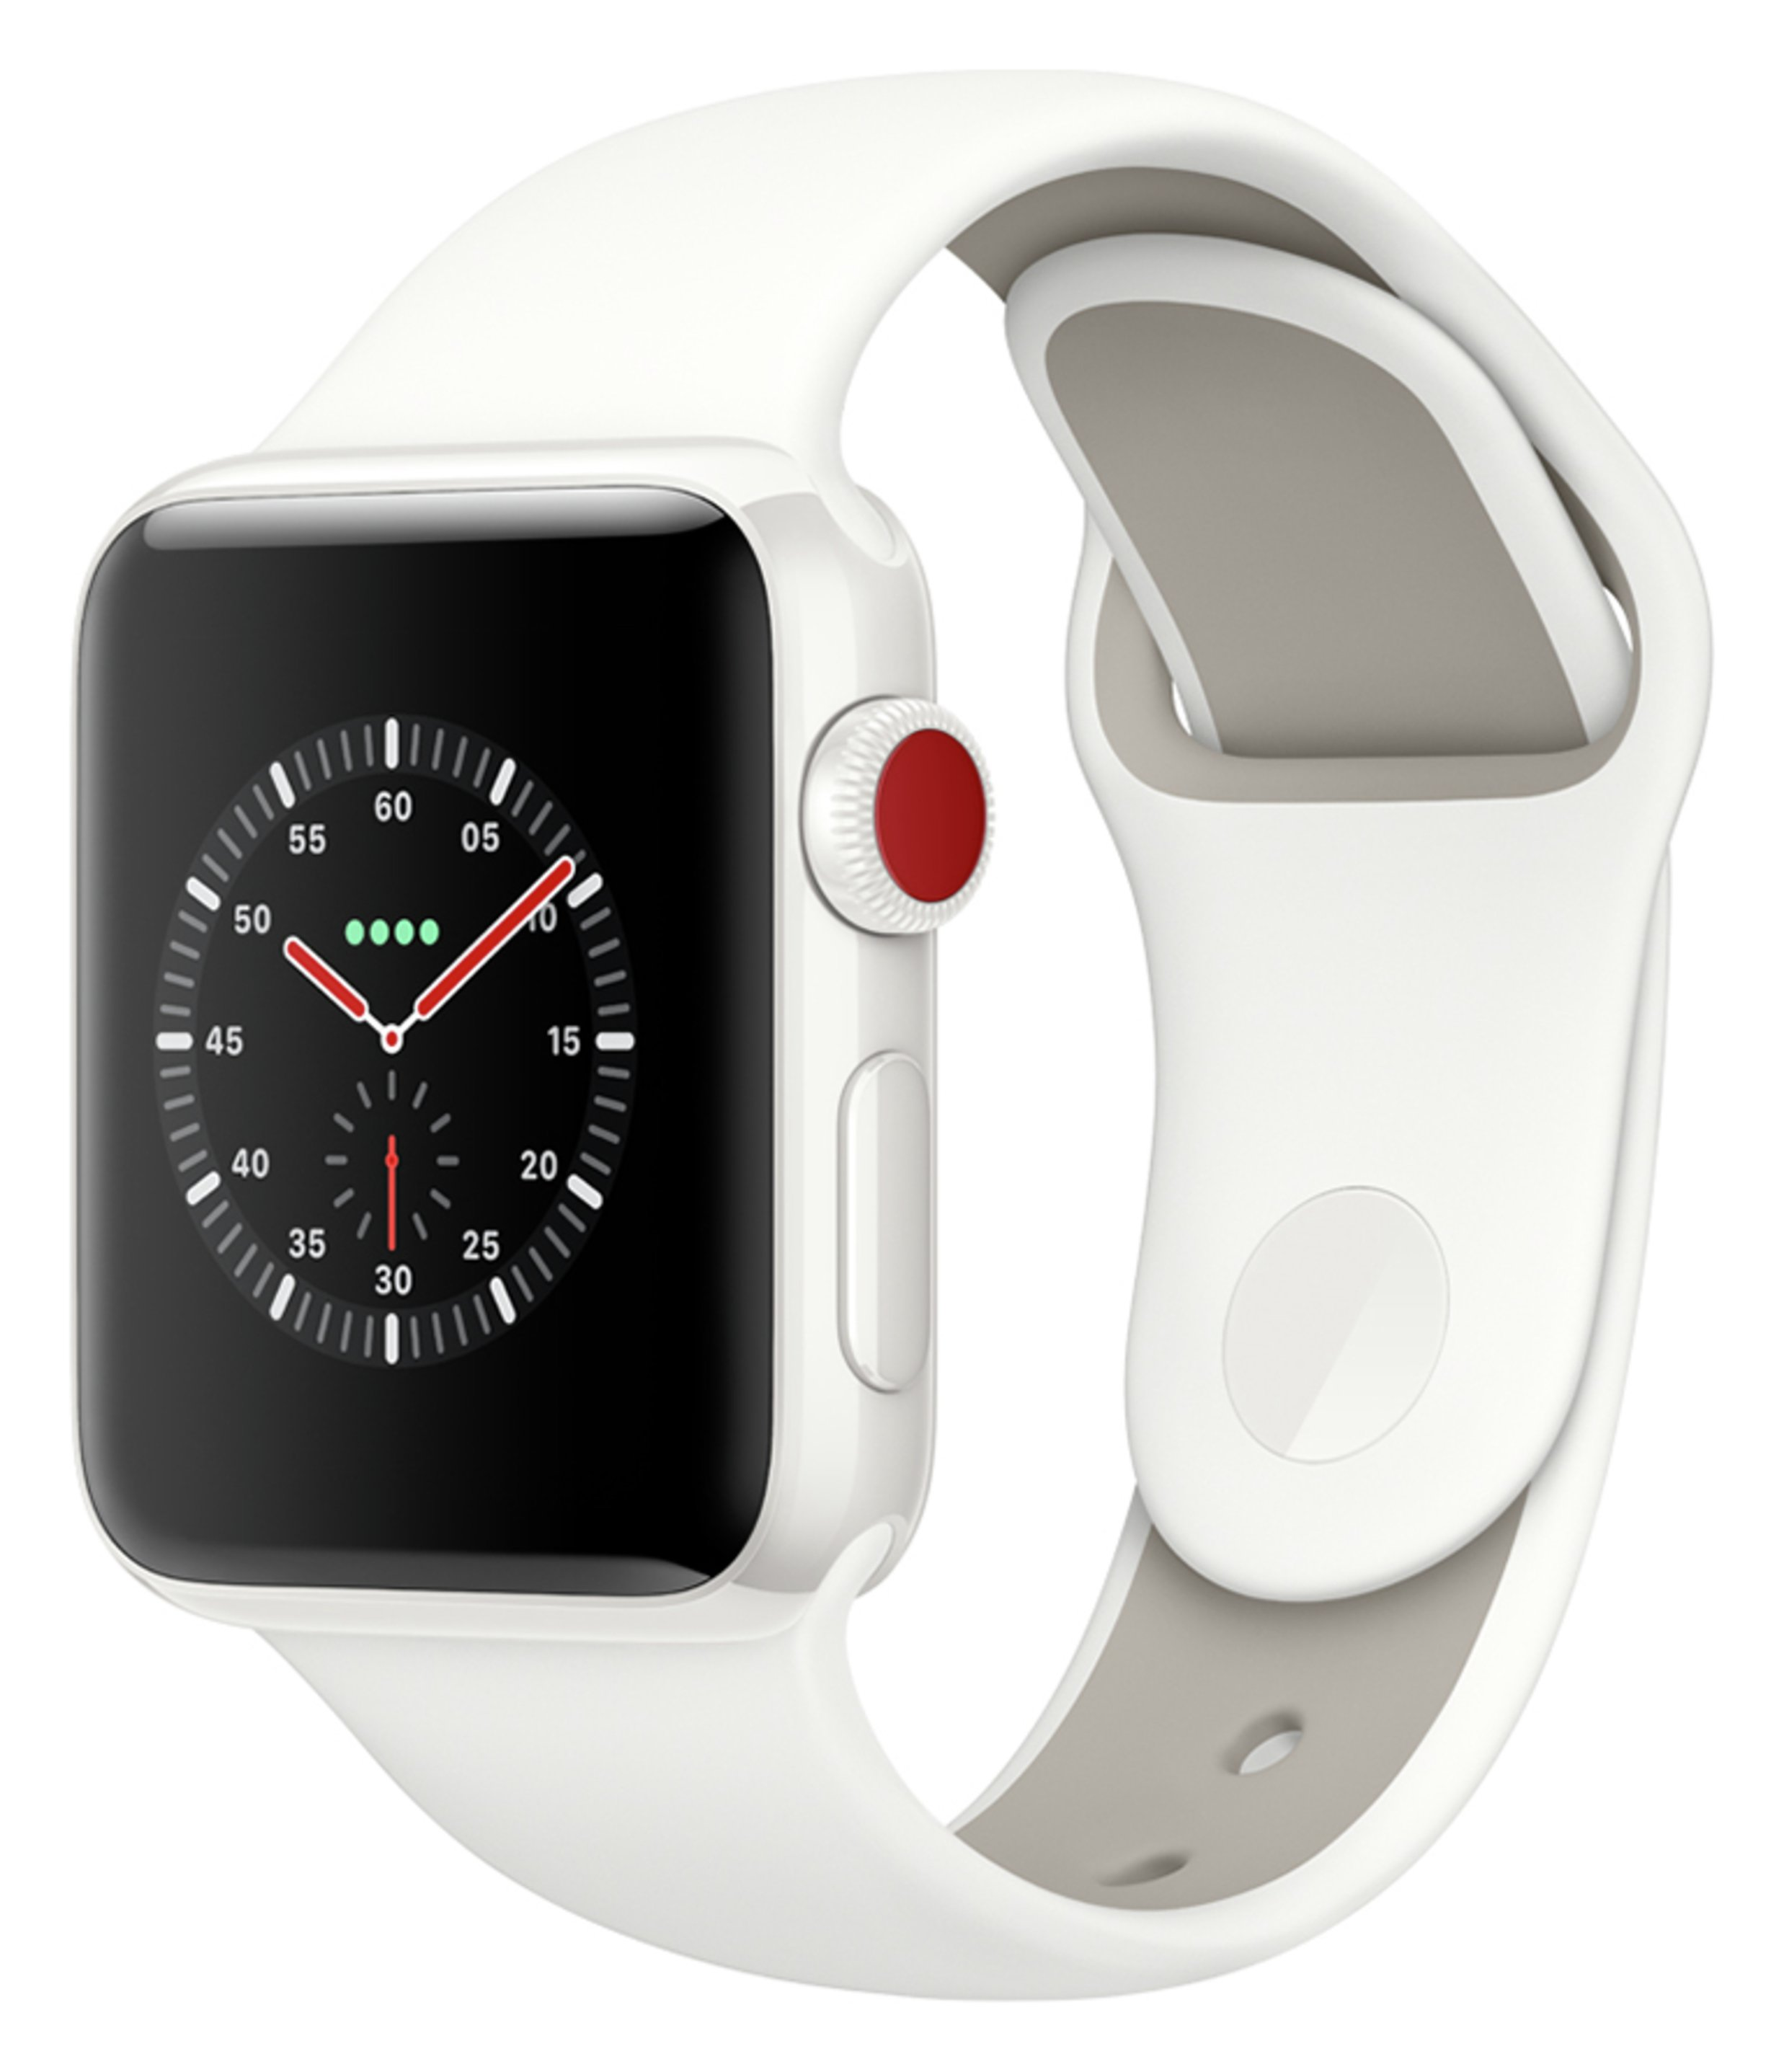 Apple Apple Watch S3 Edition Cellular 42mm - White Ceramic